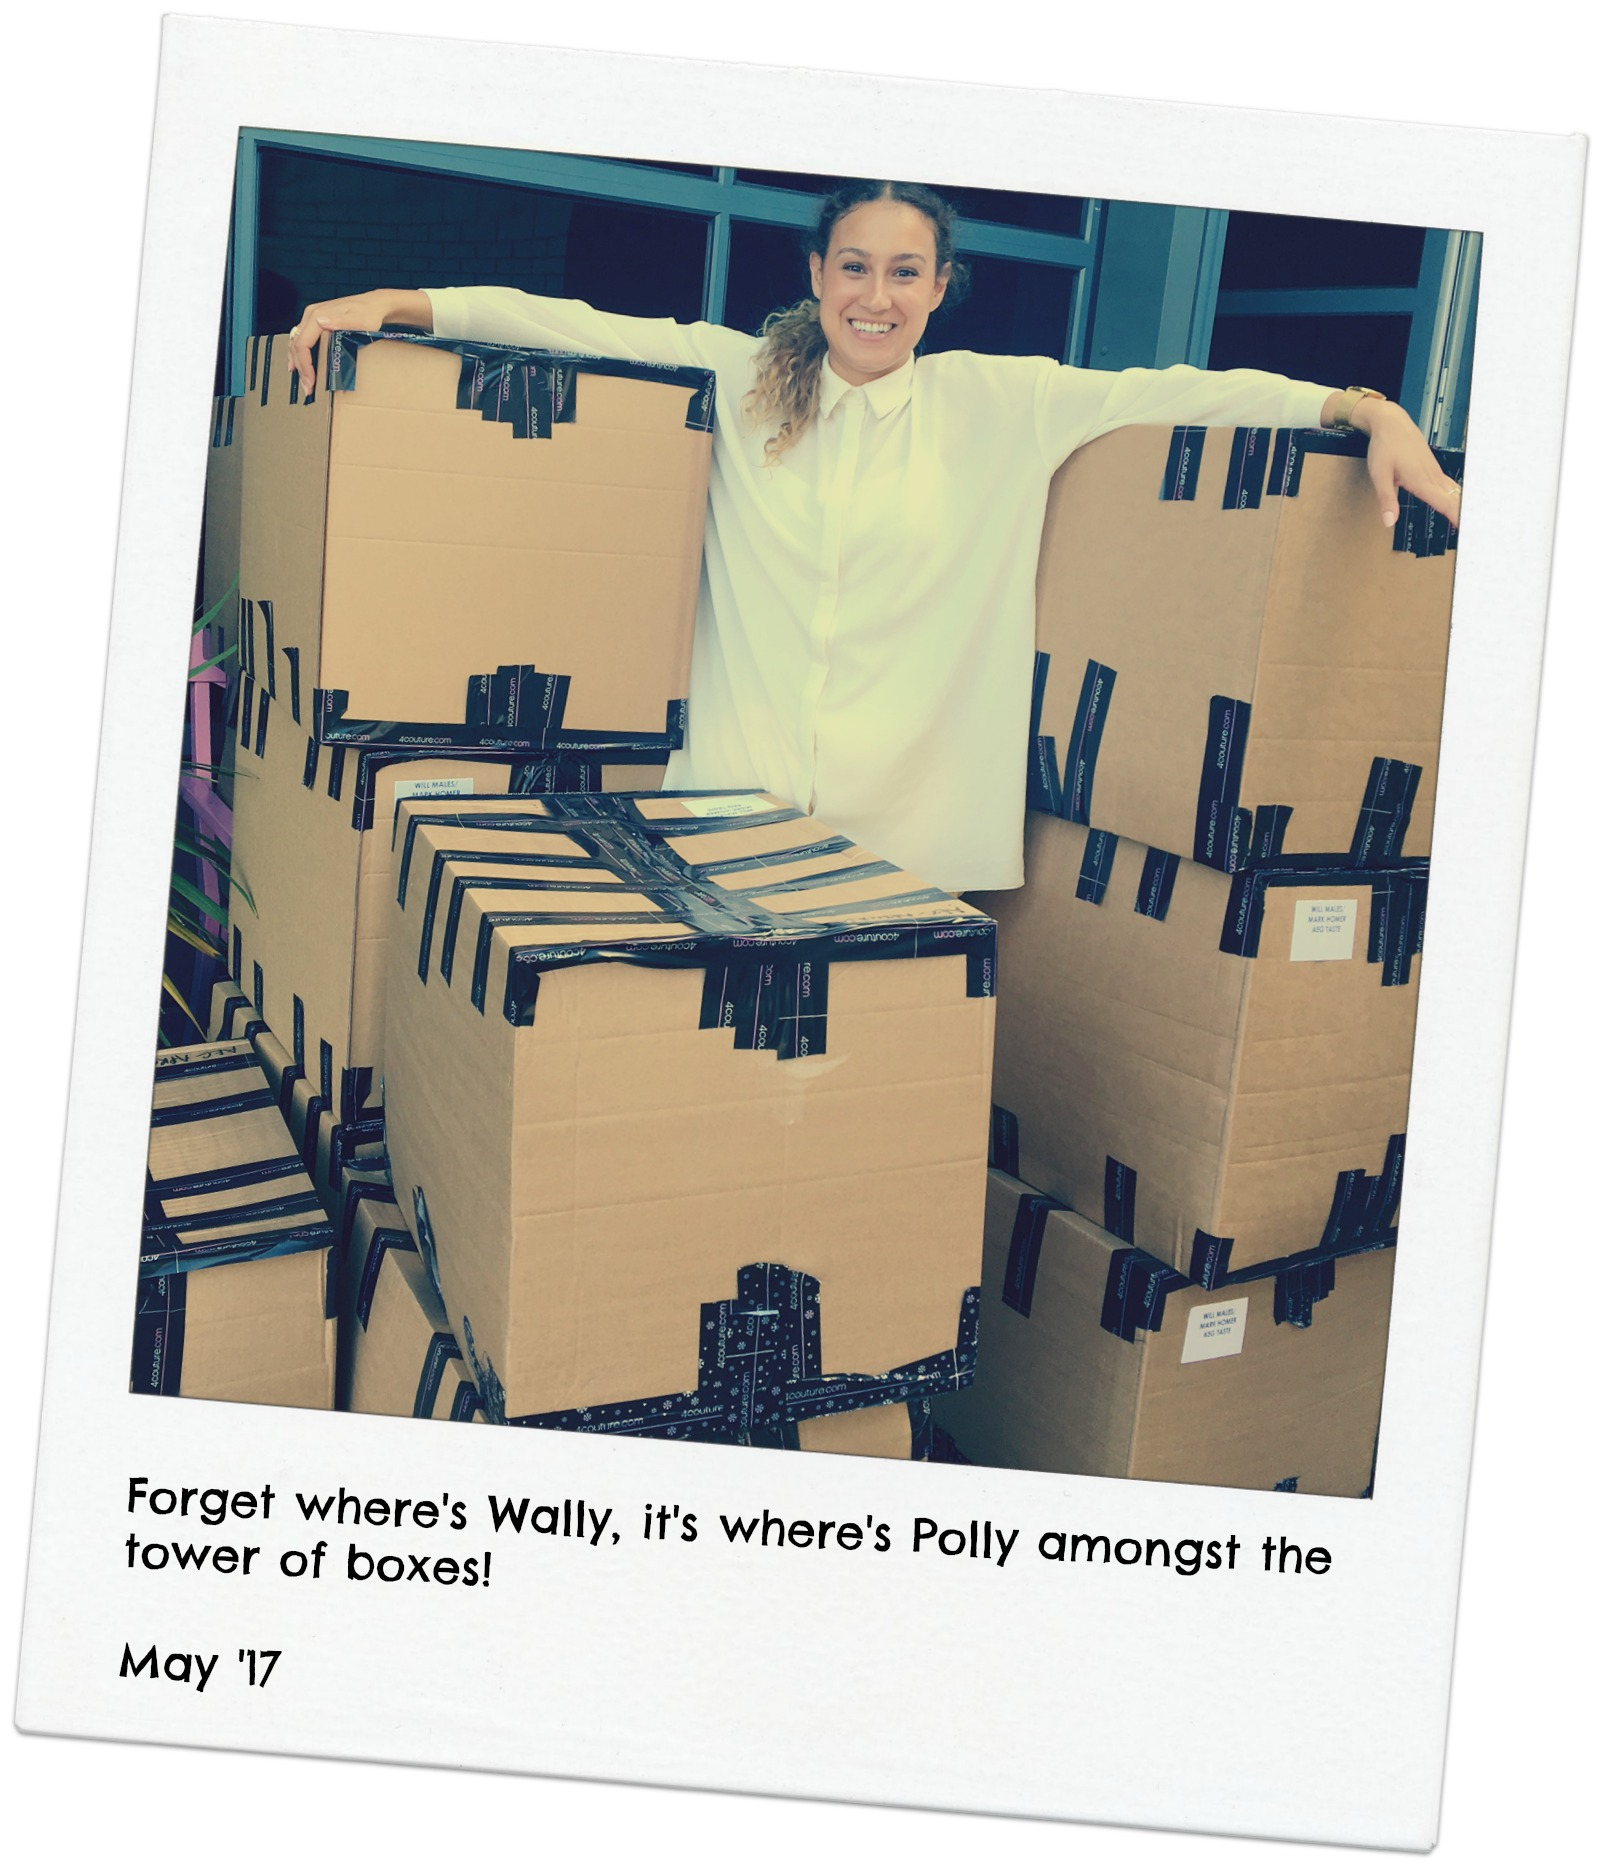 Wheres Polly BTS.jpg